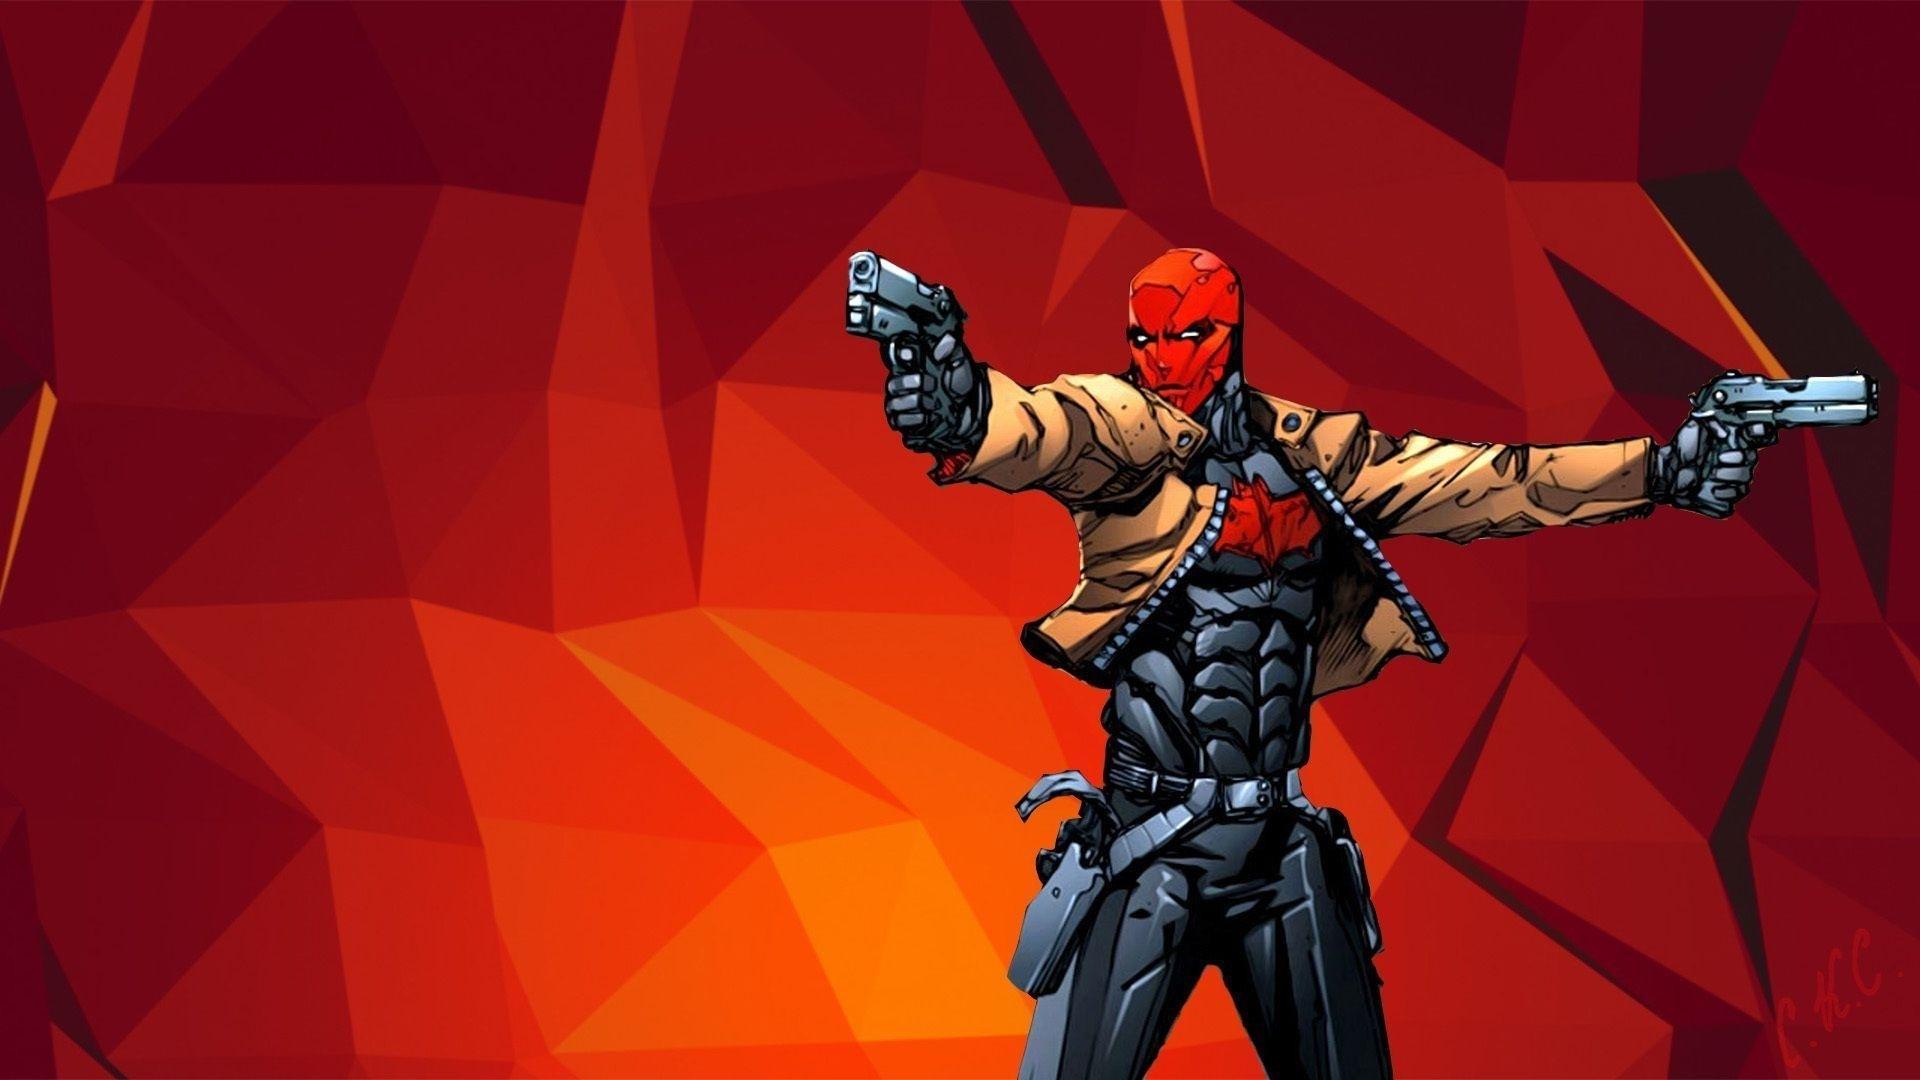 jason todd red hood wallpaper (84+ images)